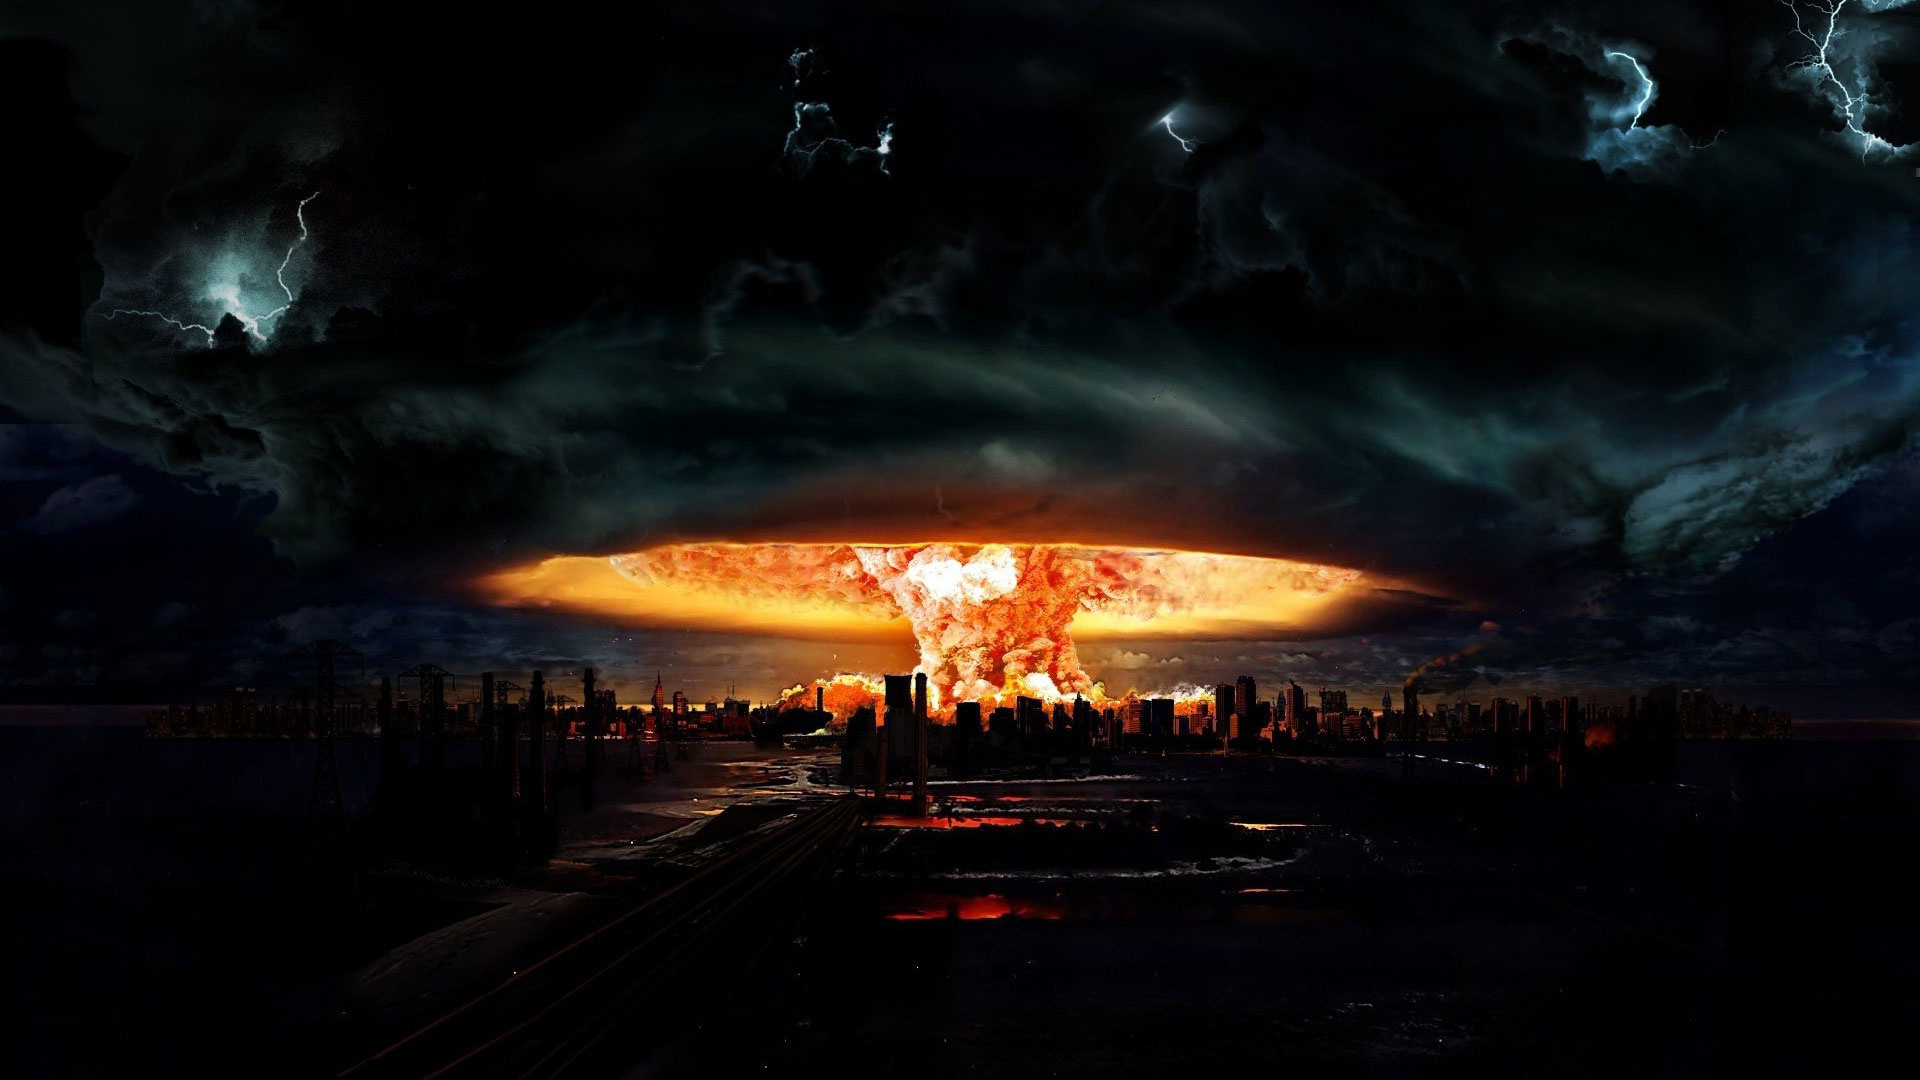 Nuclear explosion lightning storm horror wallpaper ... Real Nuclear Explosions Wallpaper